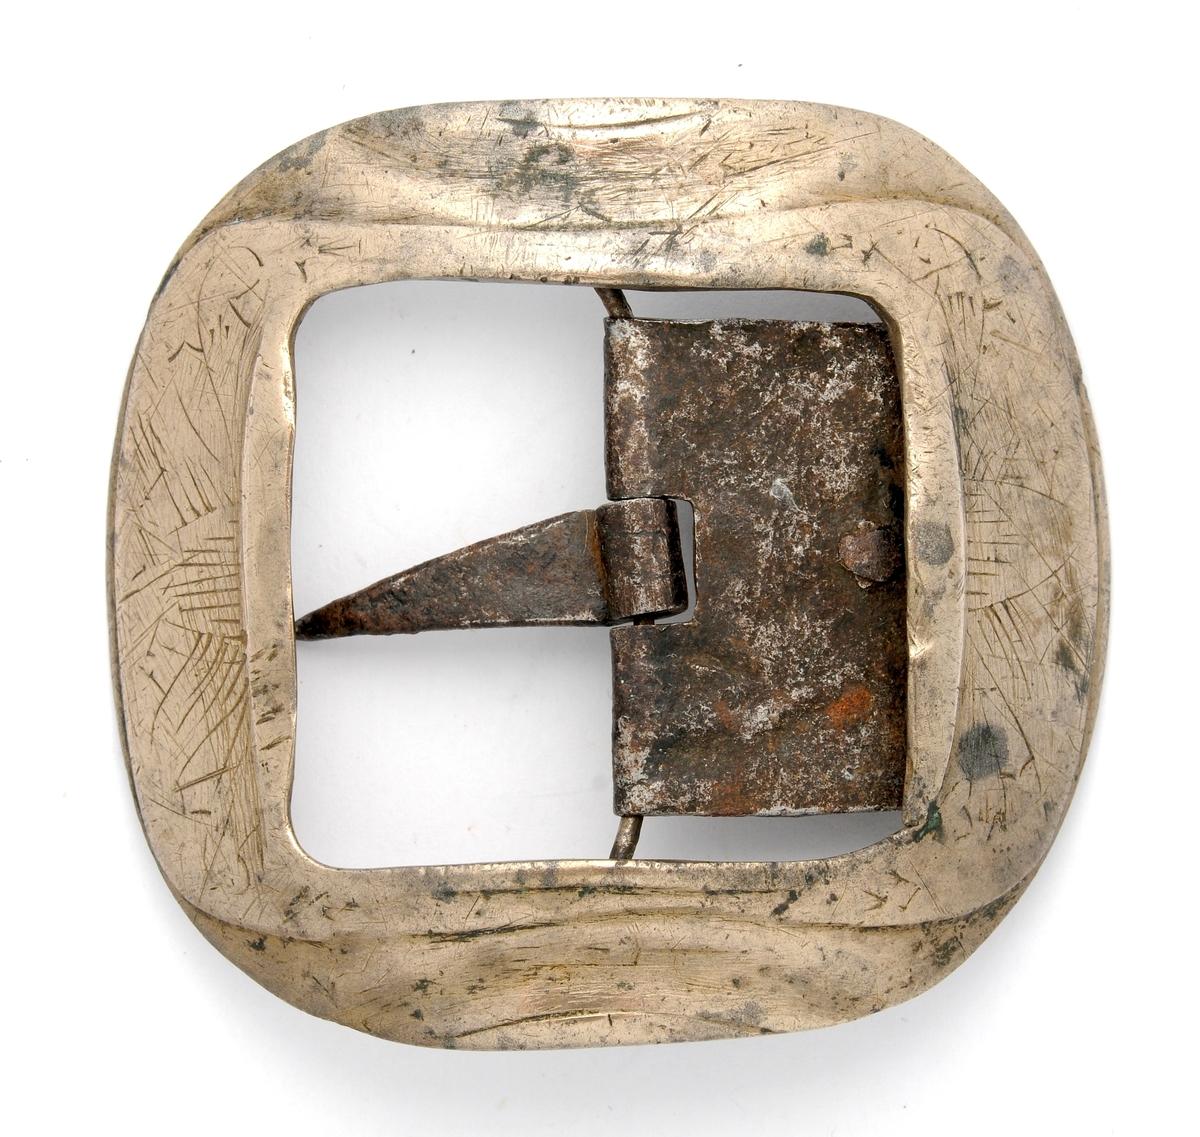 Spenne, A og B,  i støypt messing, firkanta med runde hjørner. A manglar stolpe, tann og kalv, på B er dette smidd i jern.